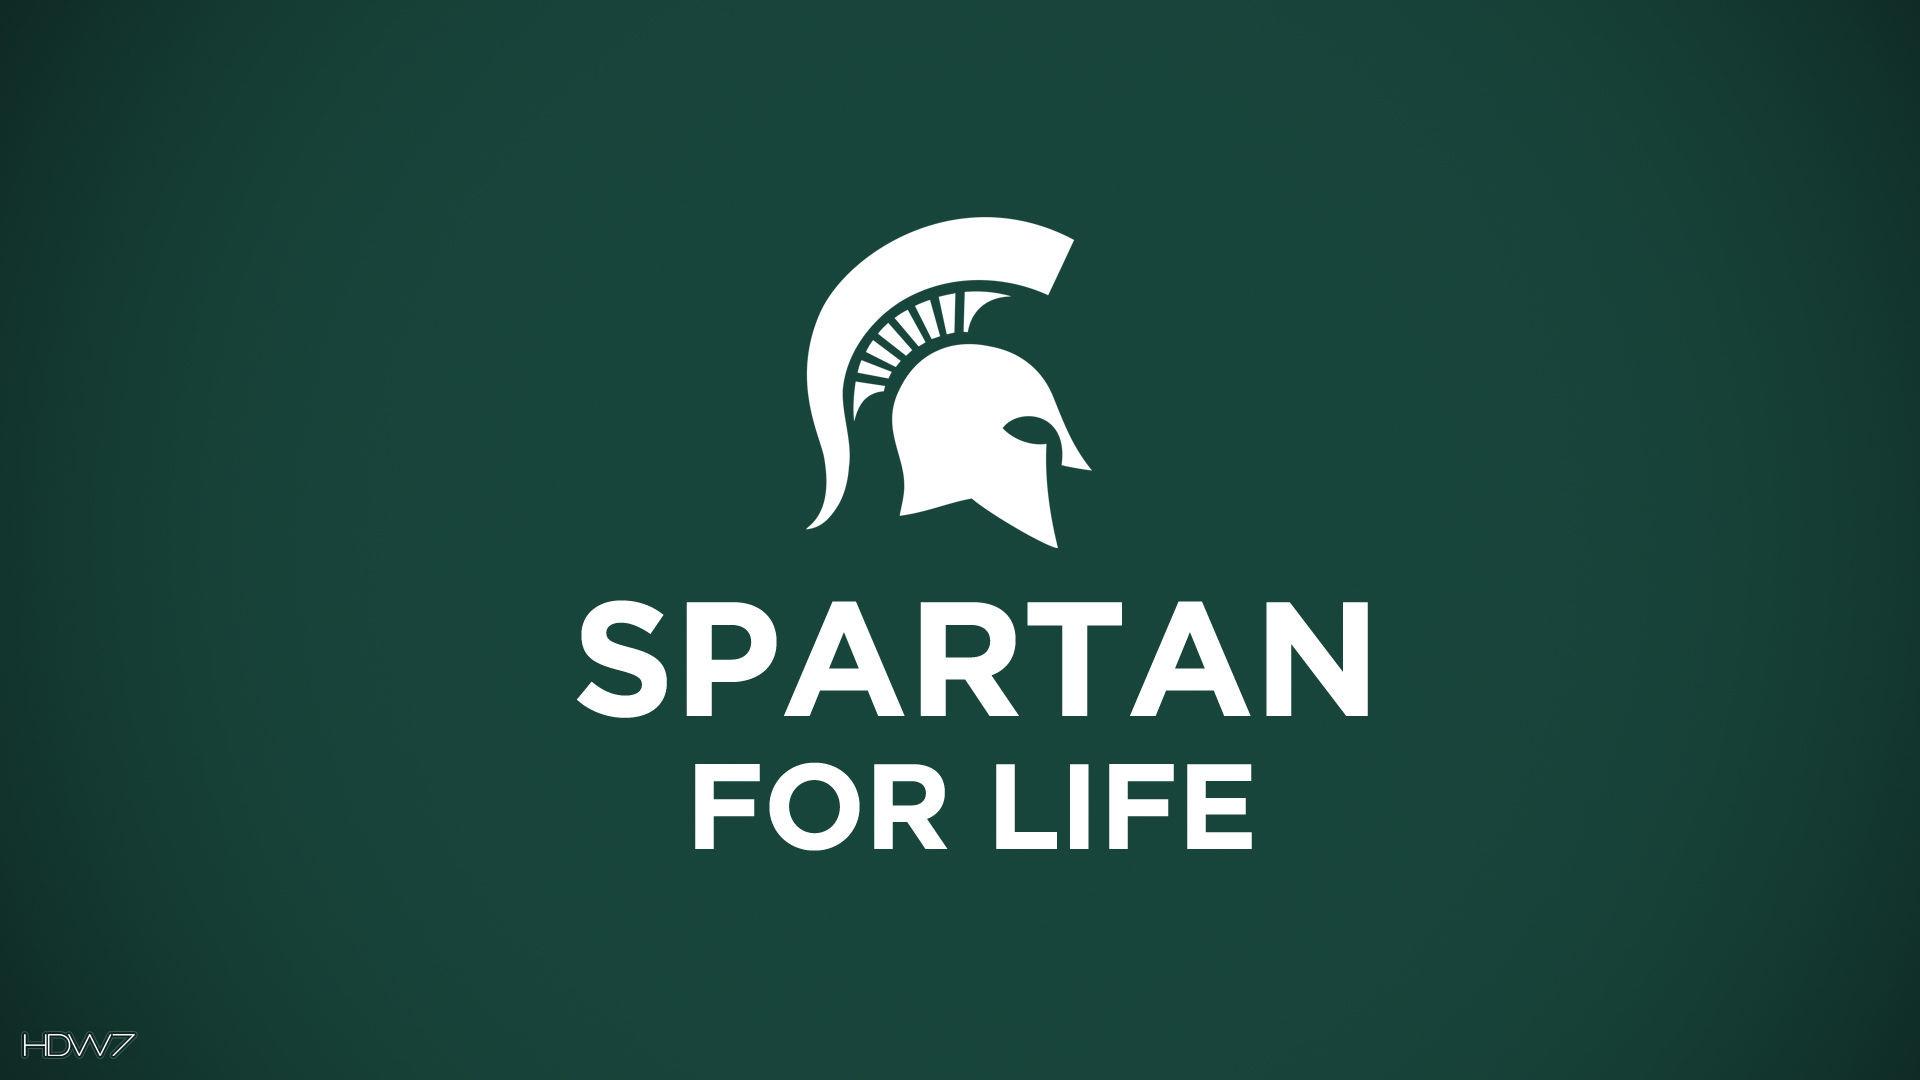 spartan for life motto -#main